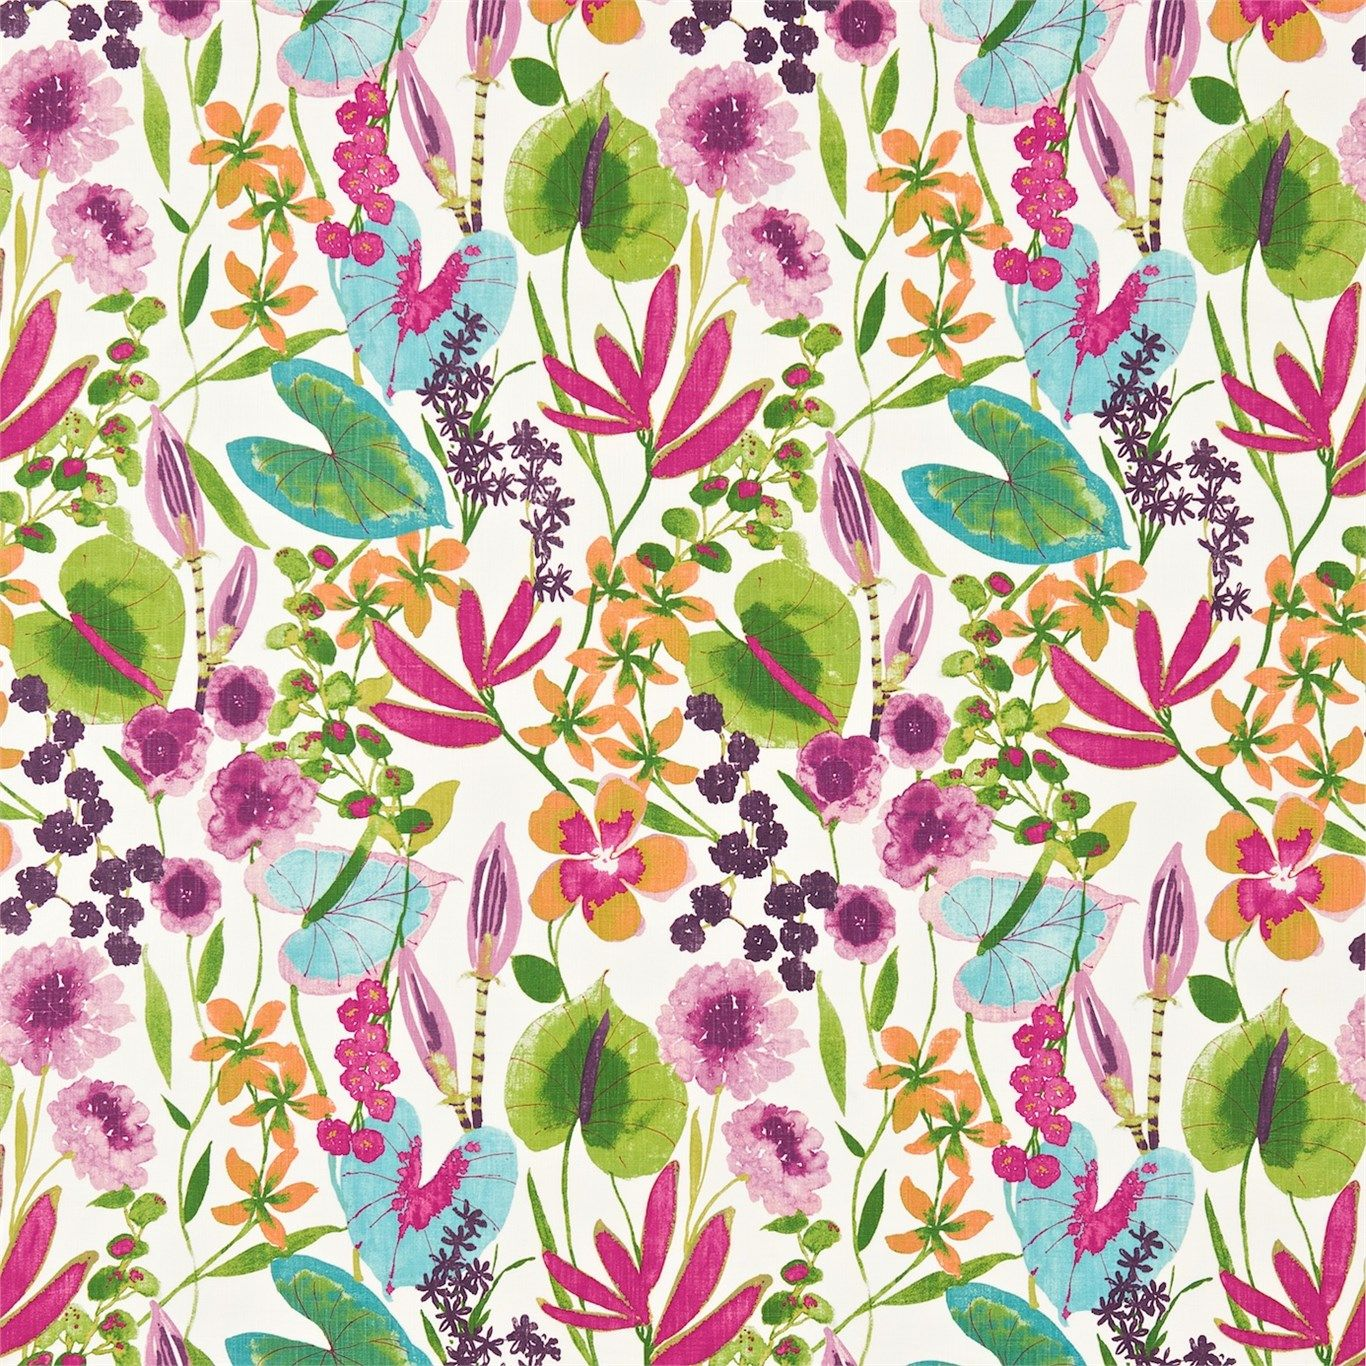 Products harlequin designer fabrics and wallpapers paradise - Harlequin Designer Fabrics And Wallcoverings Products British Uk Fabrics And Wallpapers